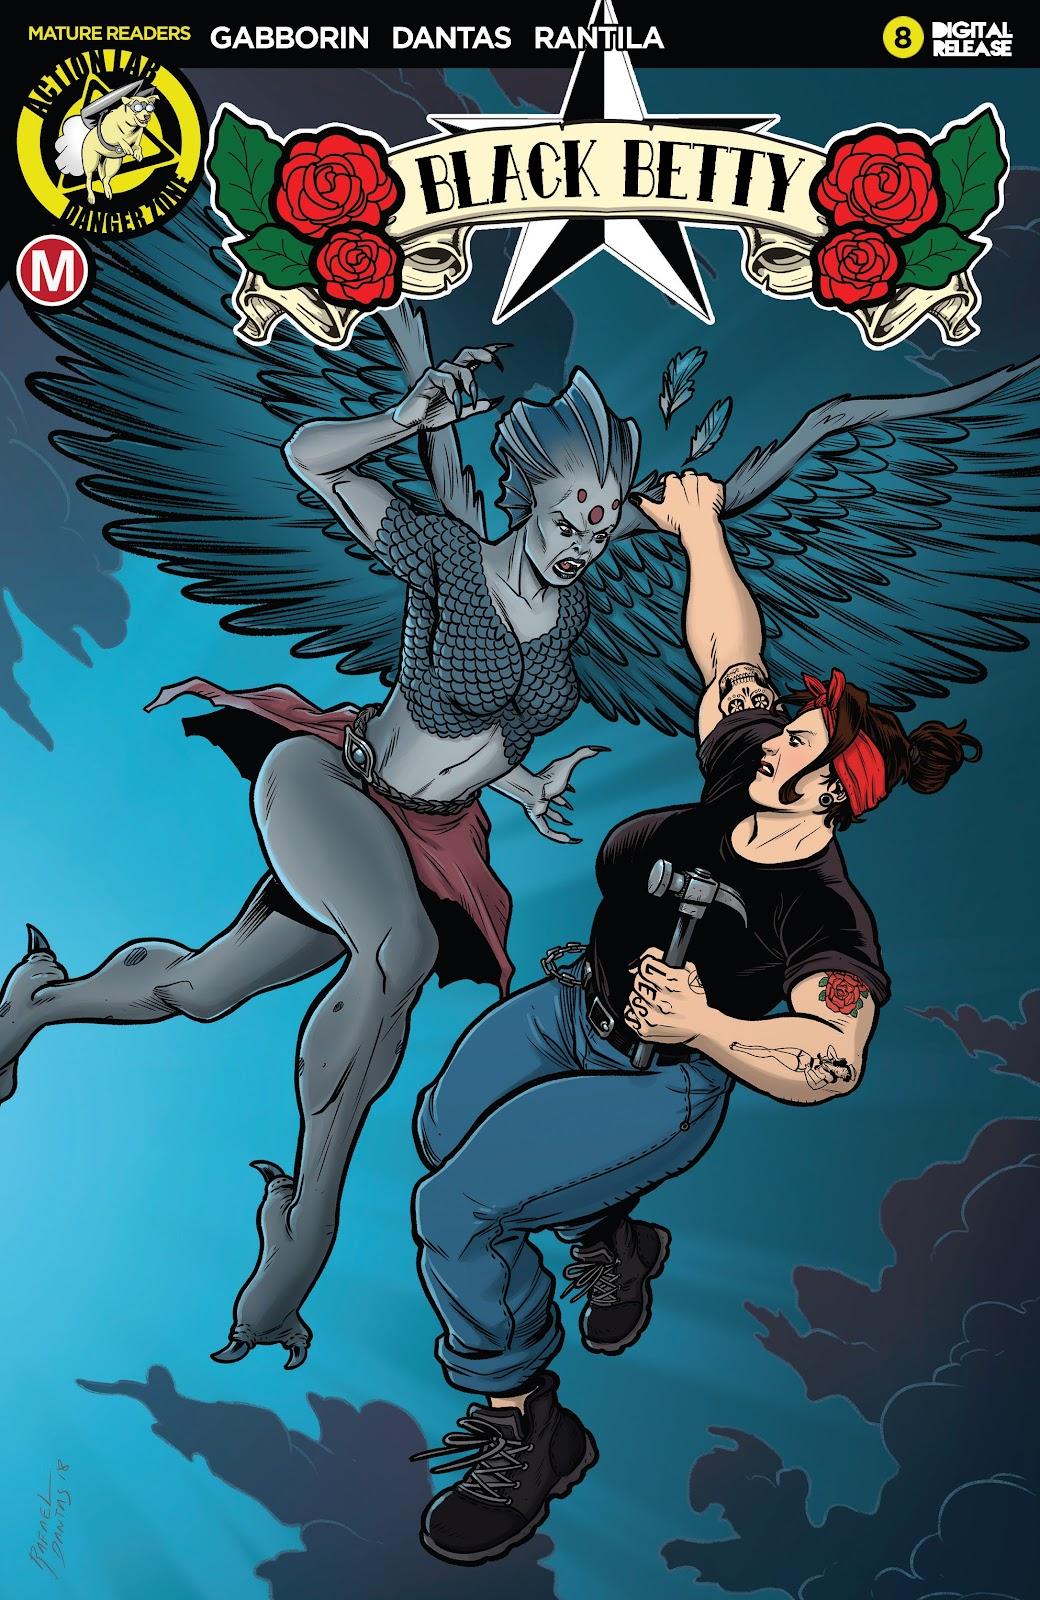 Read online Black Betty comic -  Issue #8 - 1